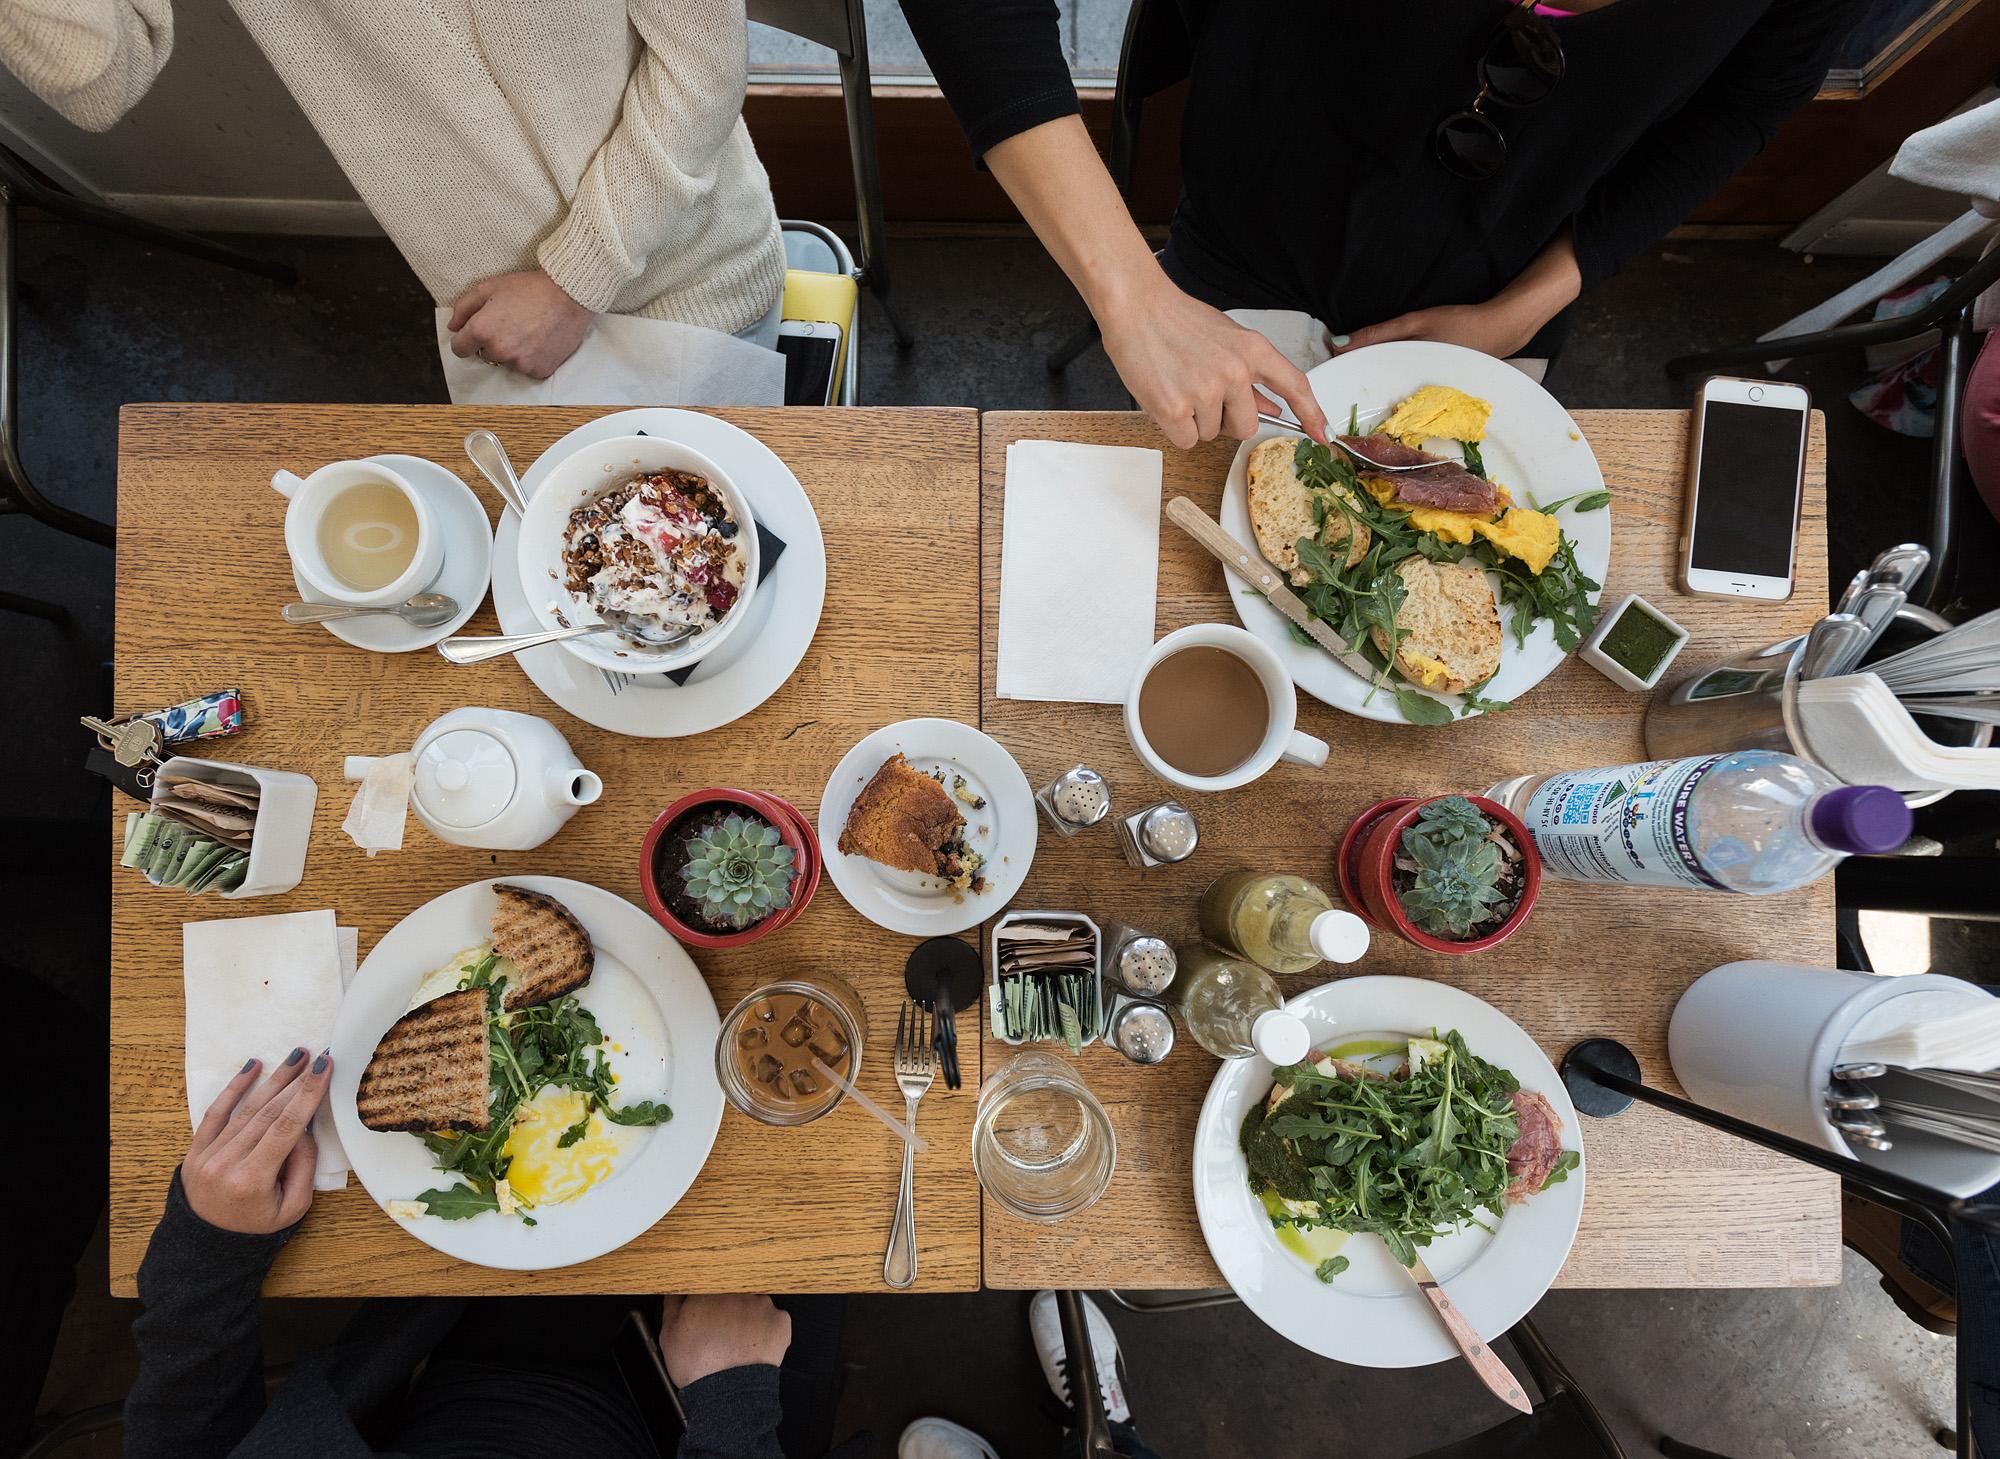 The breakfast spread at Huckleberry, Santa Monica